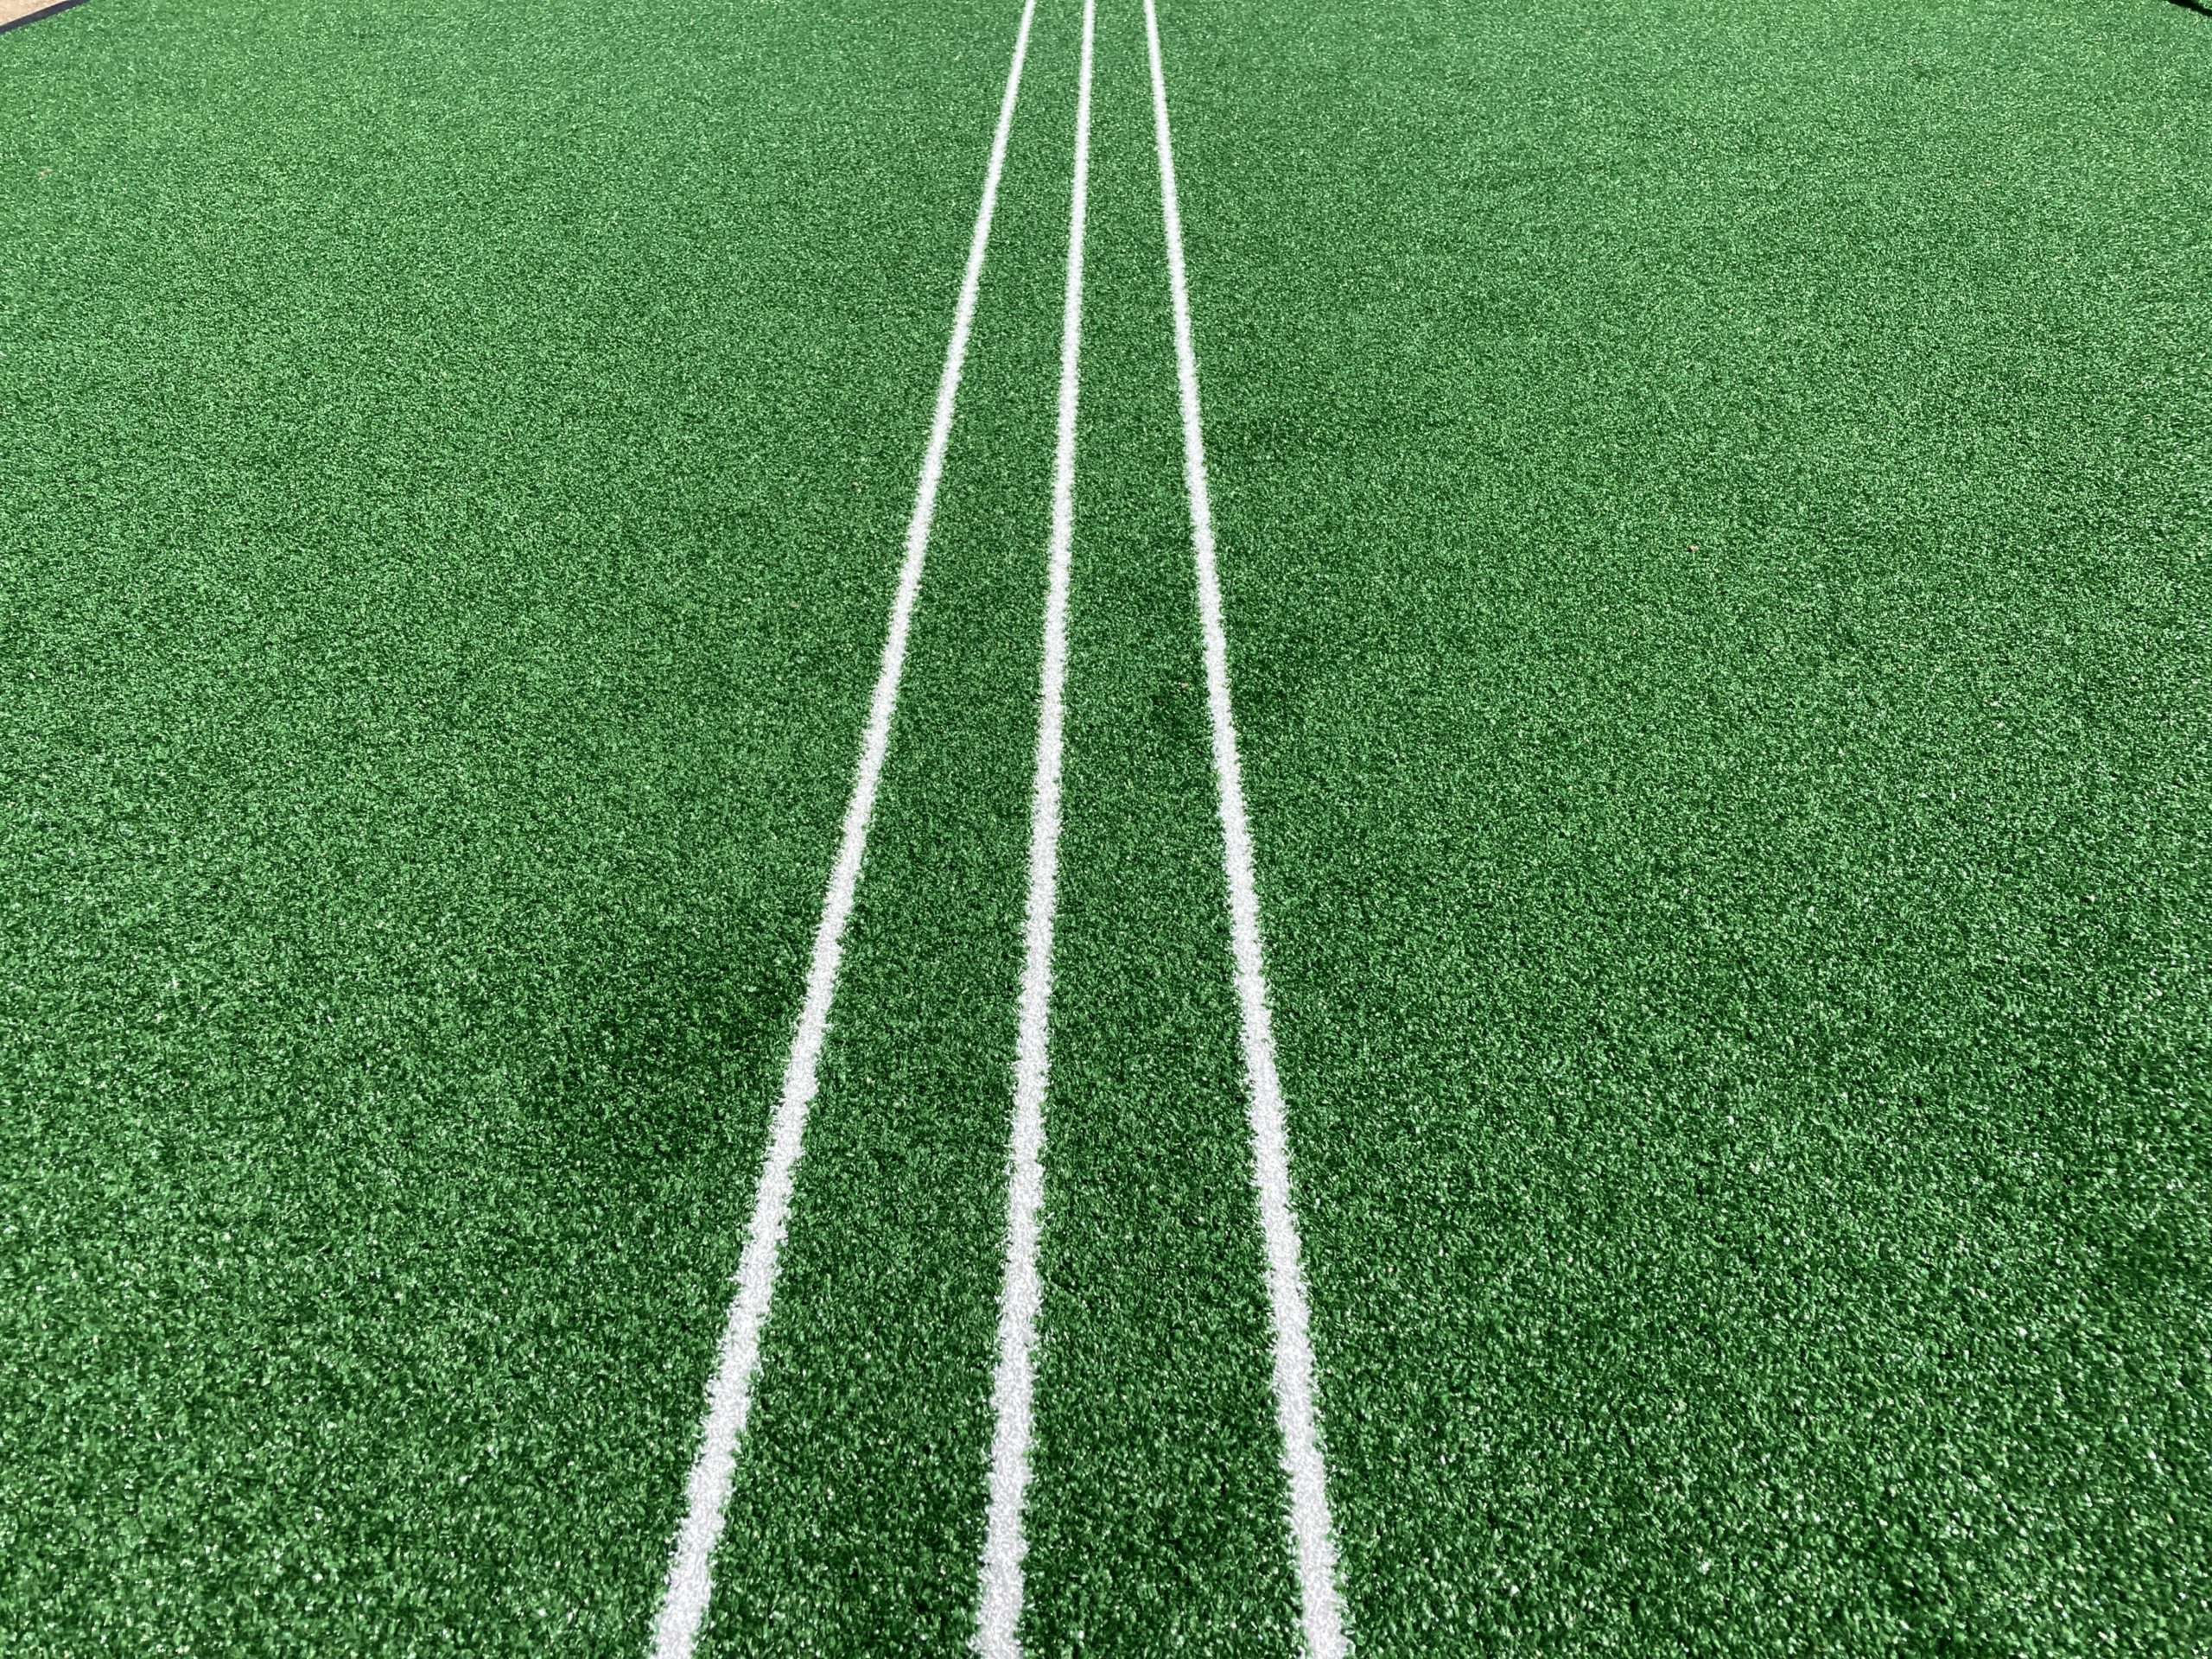 Cricket training lines